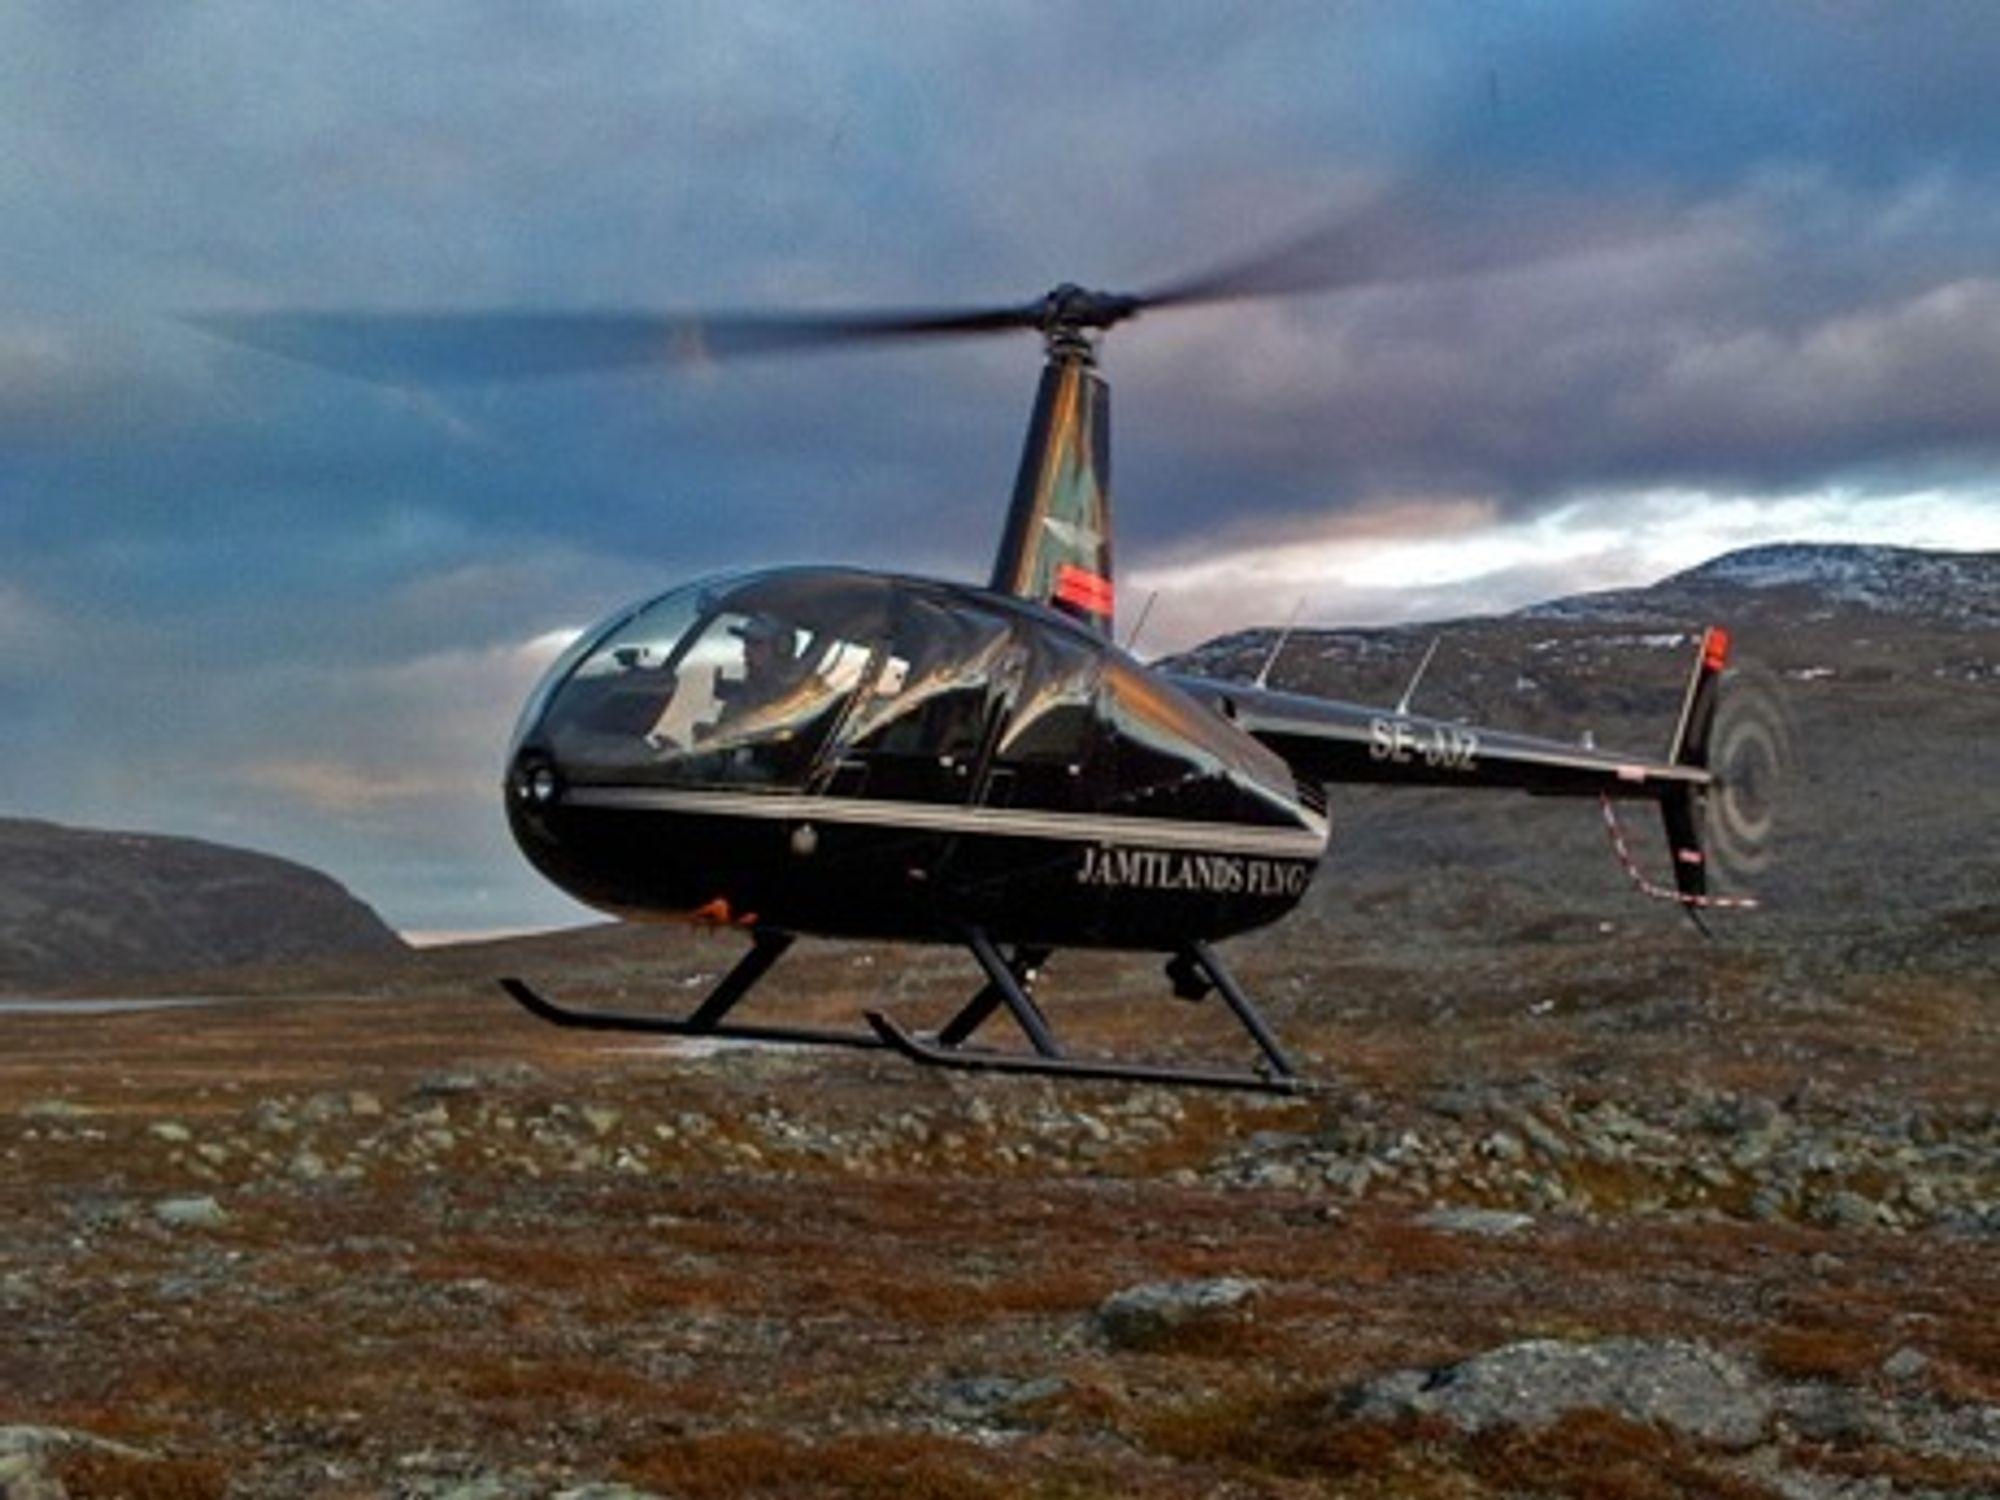 Det var et tilsvarende Robinson R44 fra Jämtlands Flyg som havarerte ved Mosjøen for snart to år siden.